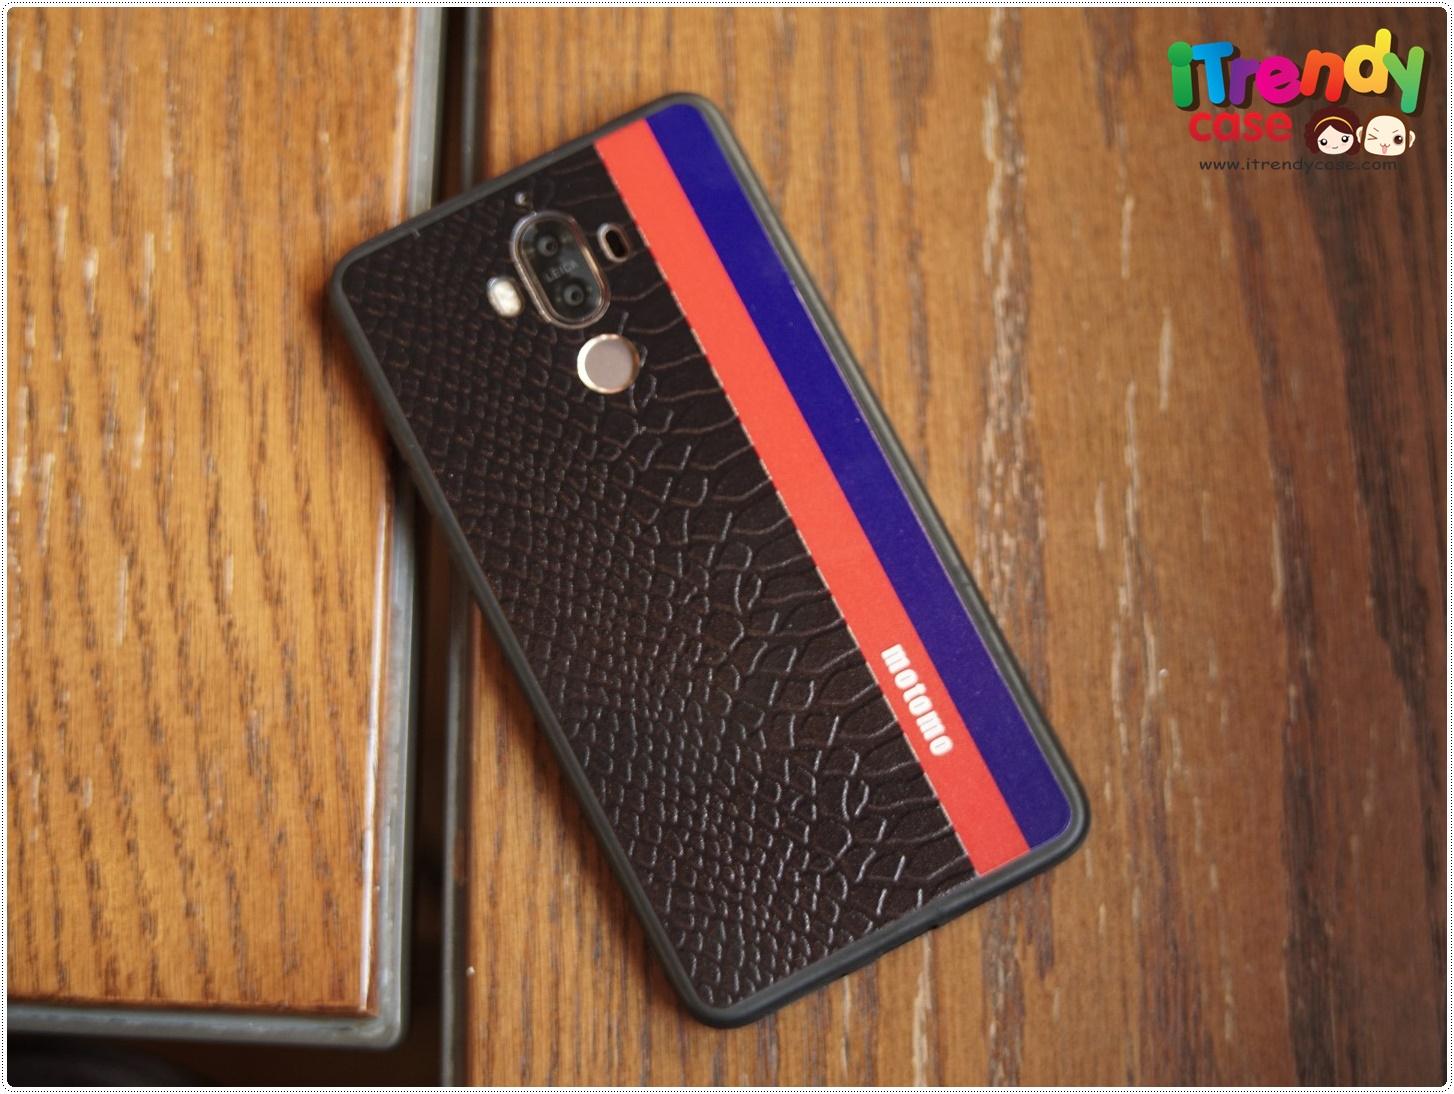 Huawei Mate9 - เคสลายหนังสีดำ คาดแดงน้ำเงิน motomo